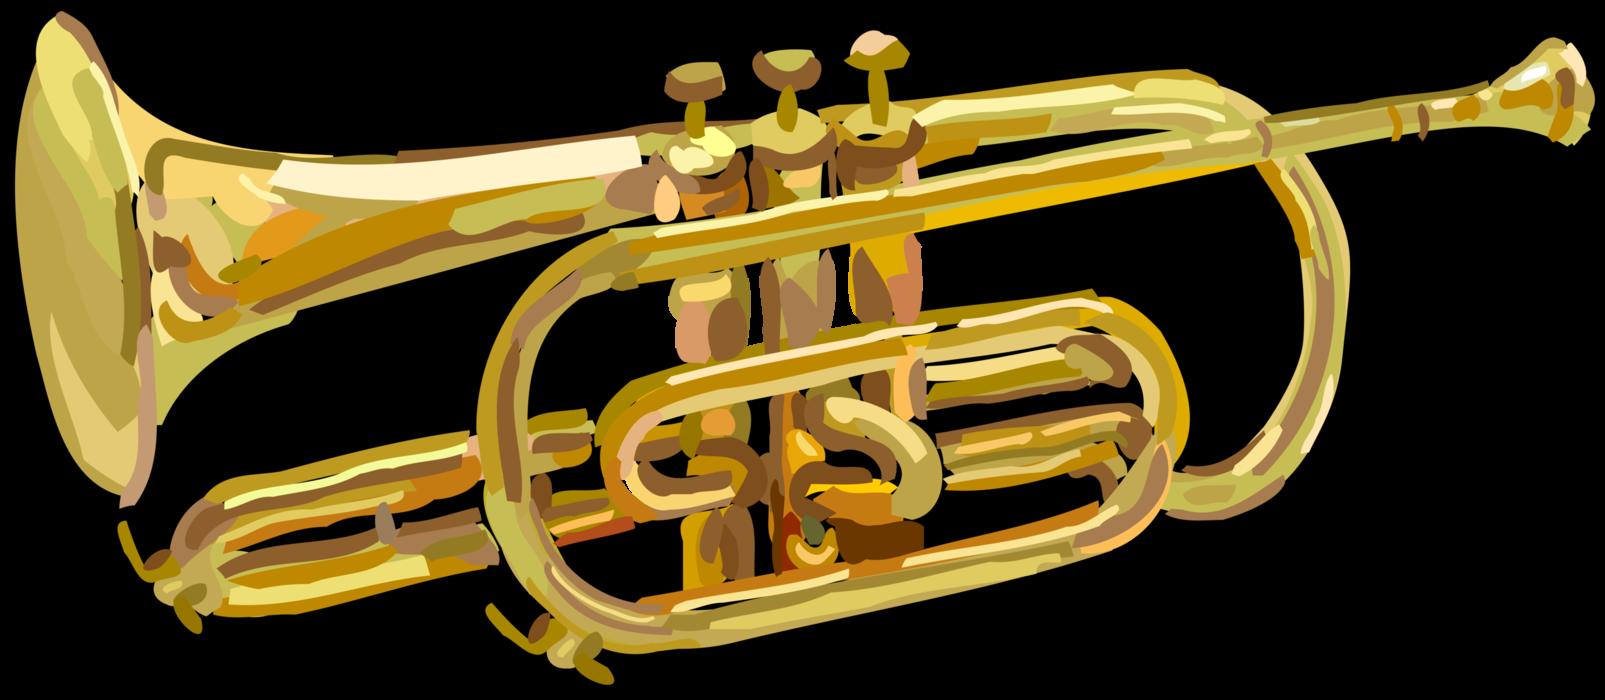 Trumpet instrument vector image. Horn clipart musical intrument